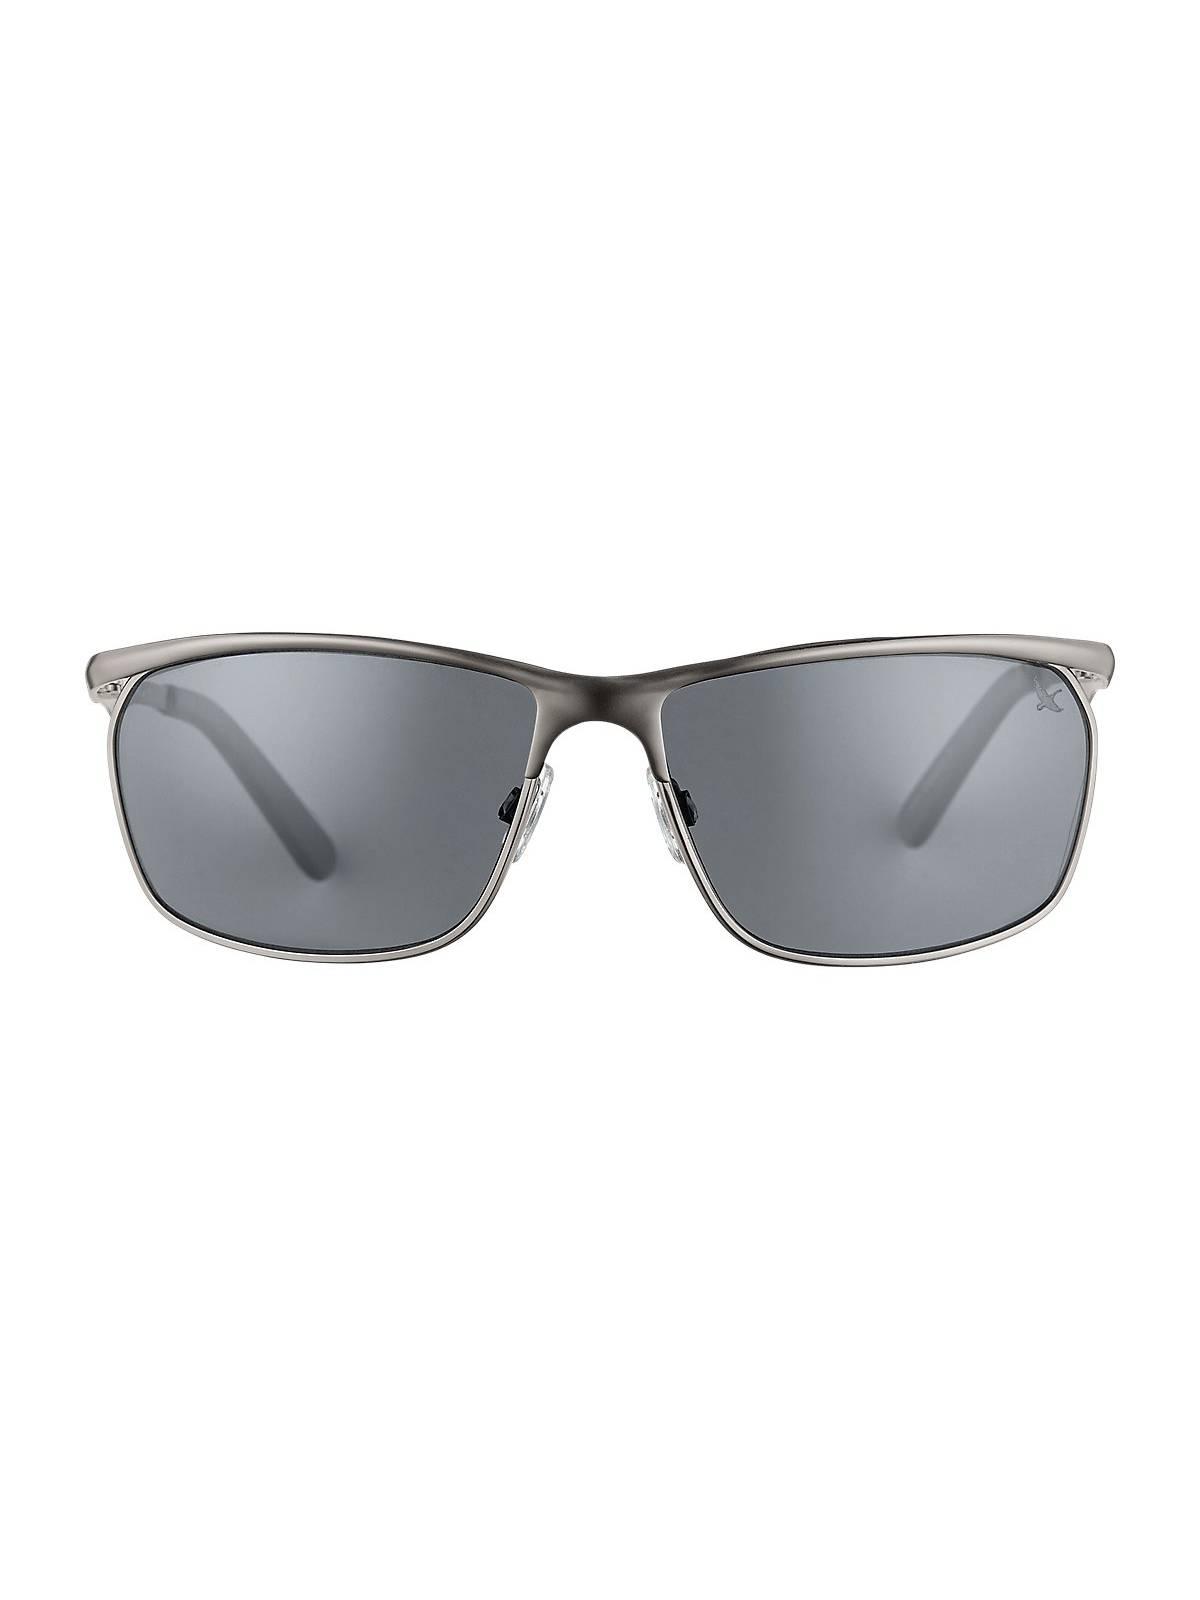 de777be347c9 Eddie Bauer Unisex-Adult Eastlake Polarized Sunglasses